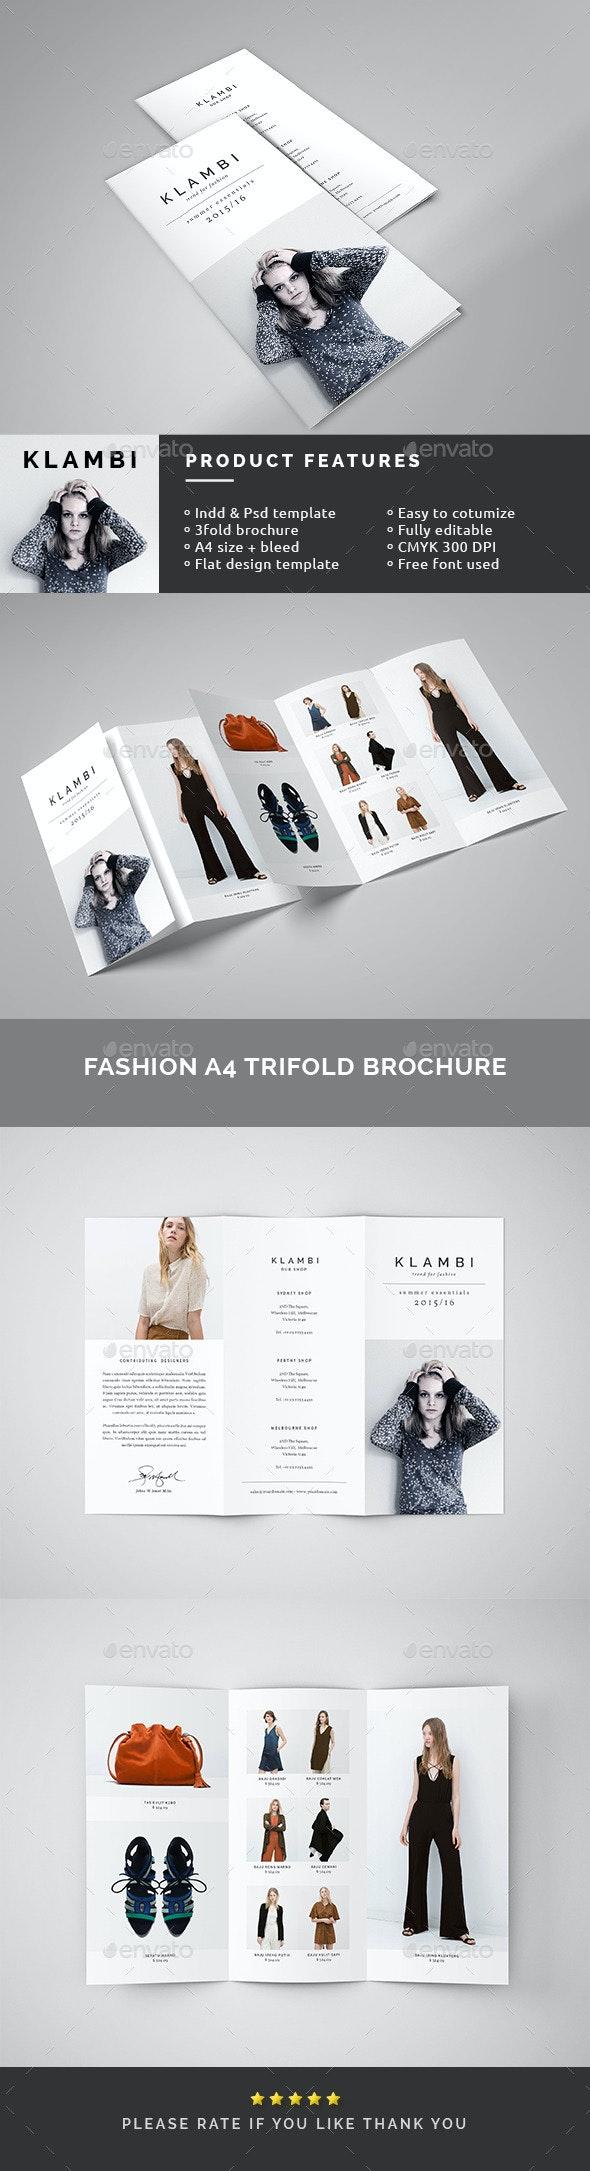 Fashion A4 Trifold Brochure - Catalogs Brochures